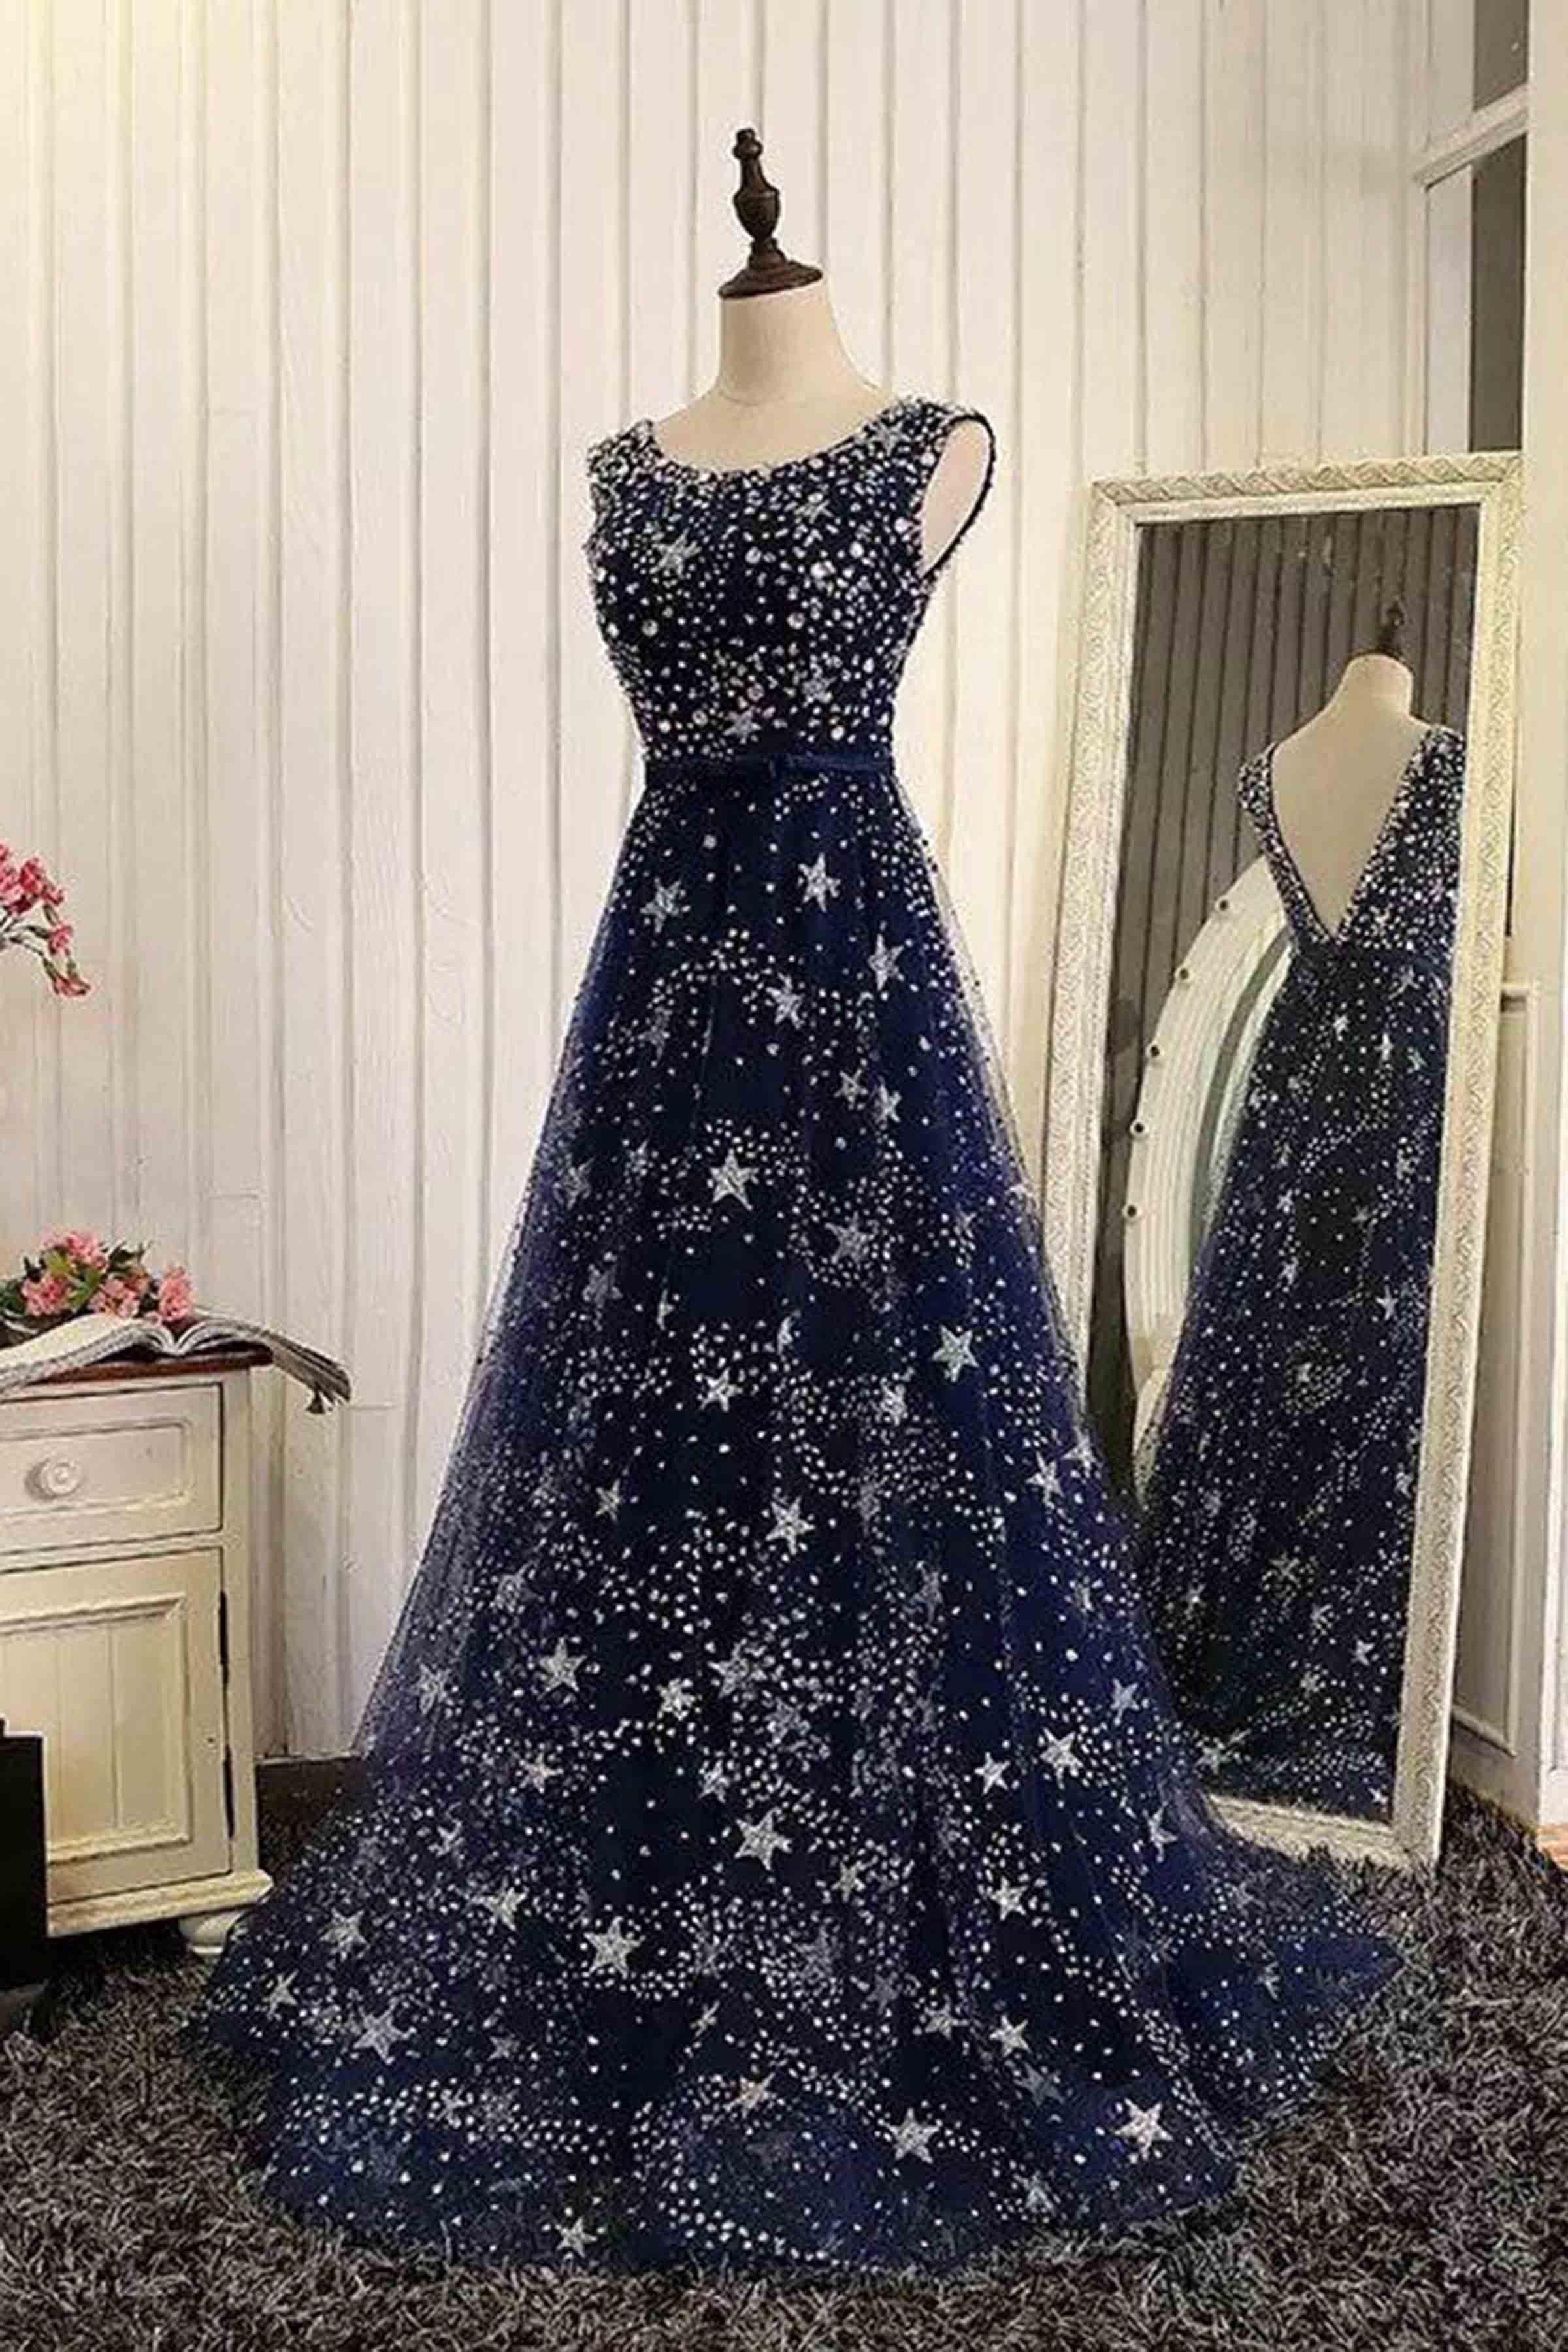 Luxury blue tulle star sequins beaded floor-length long evening dresses -   16 dress Nigth formal ideas